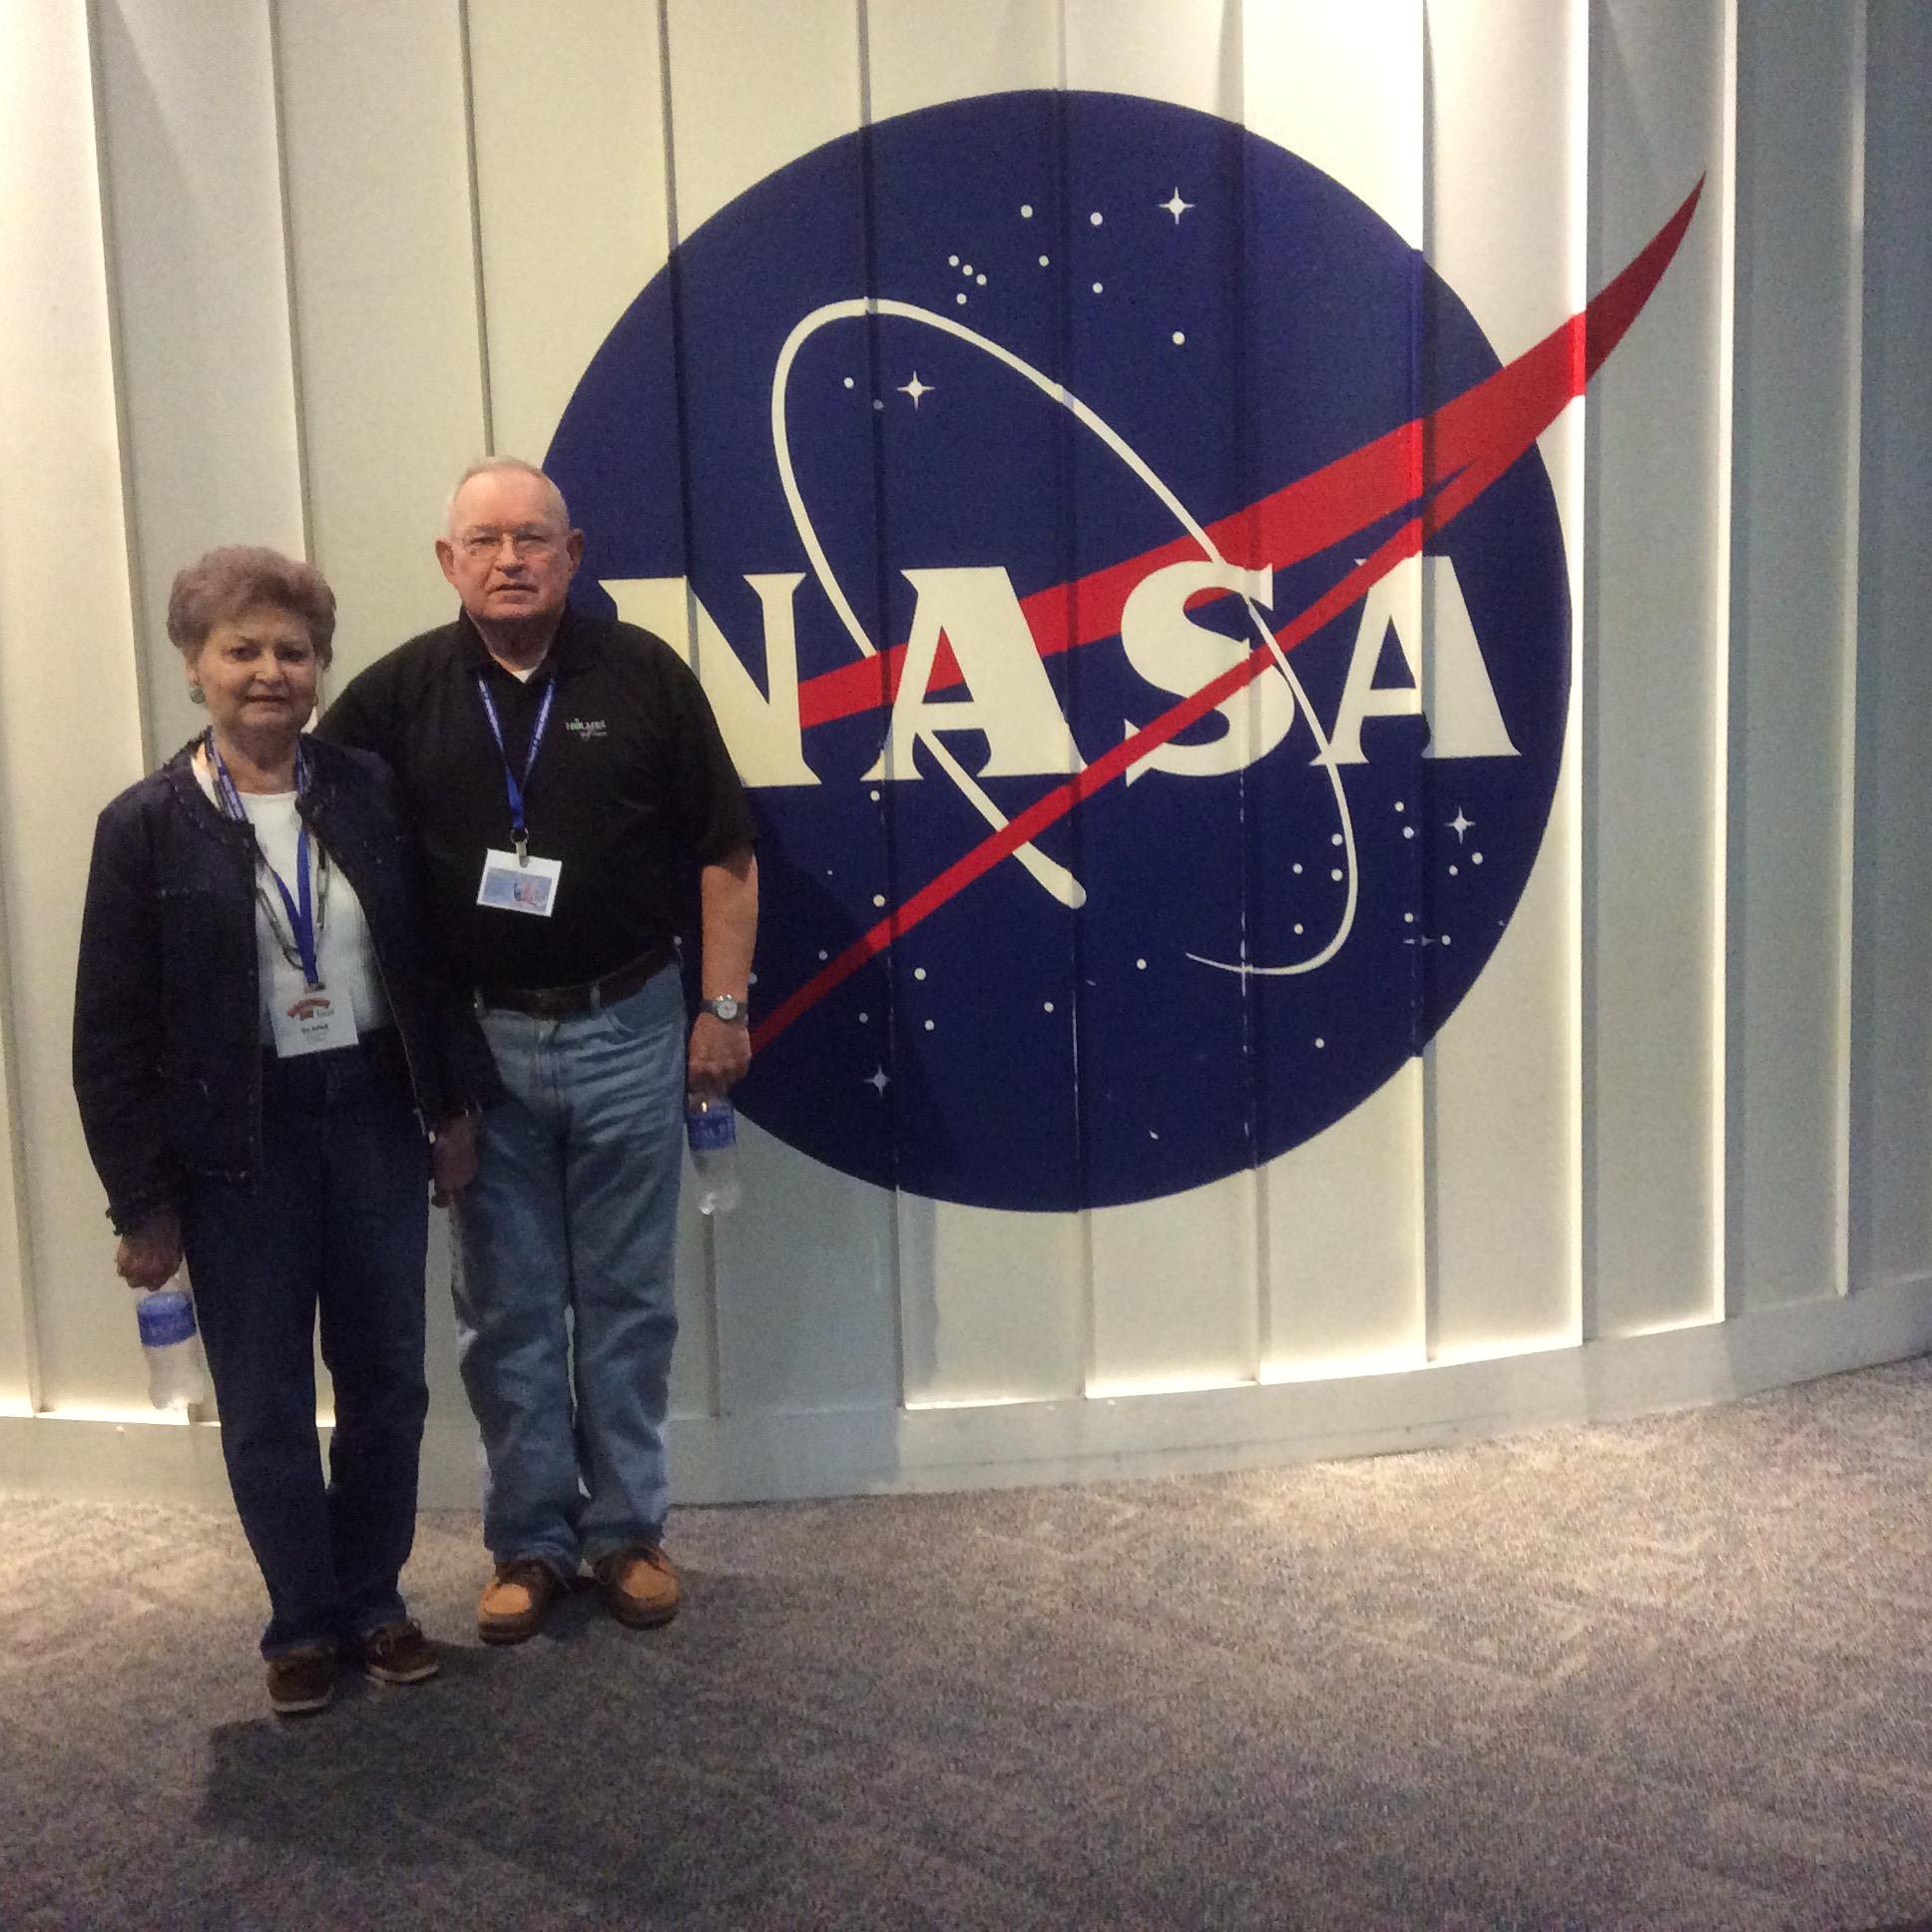 Kennedy Space Center Houston